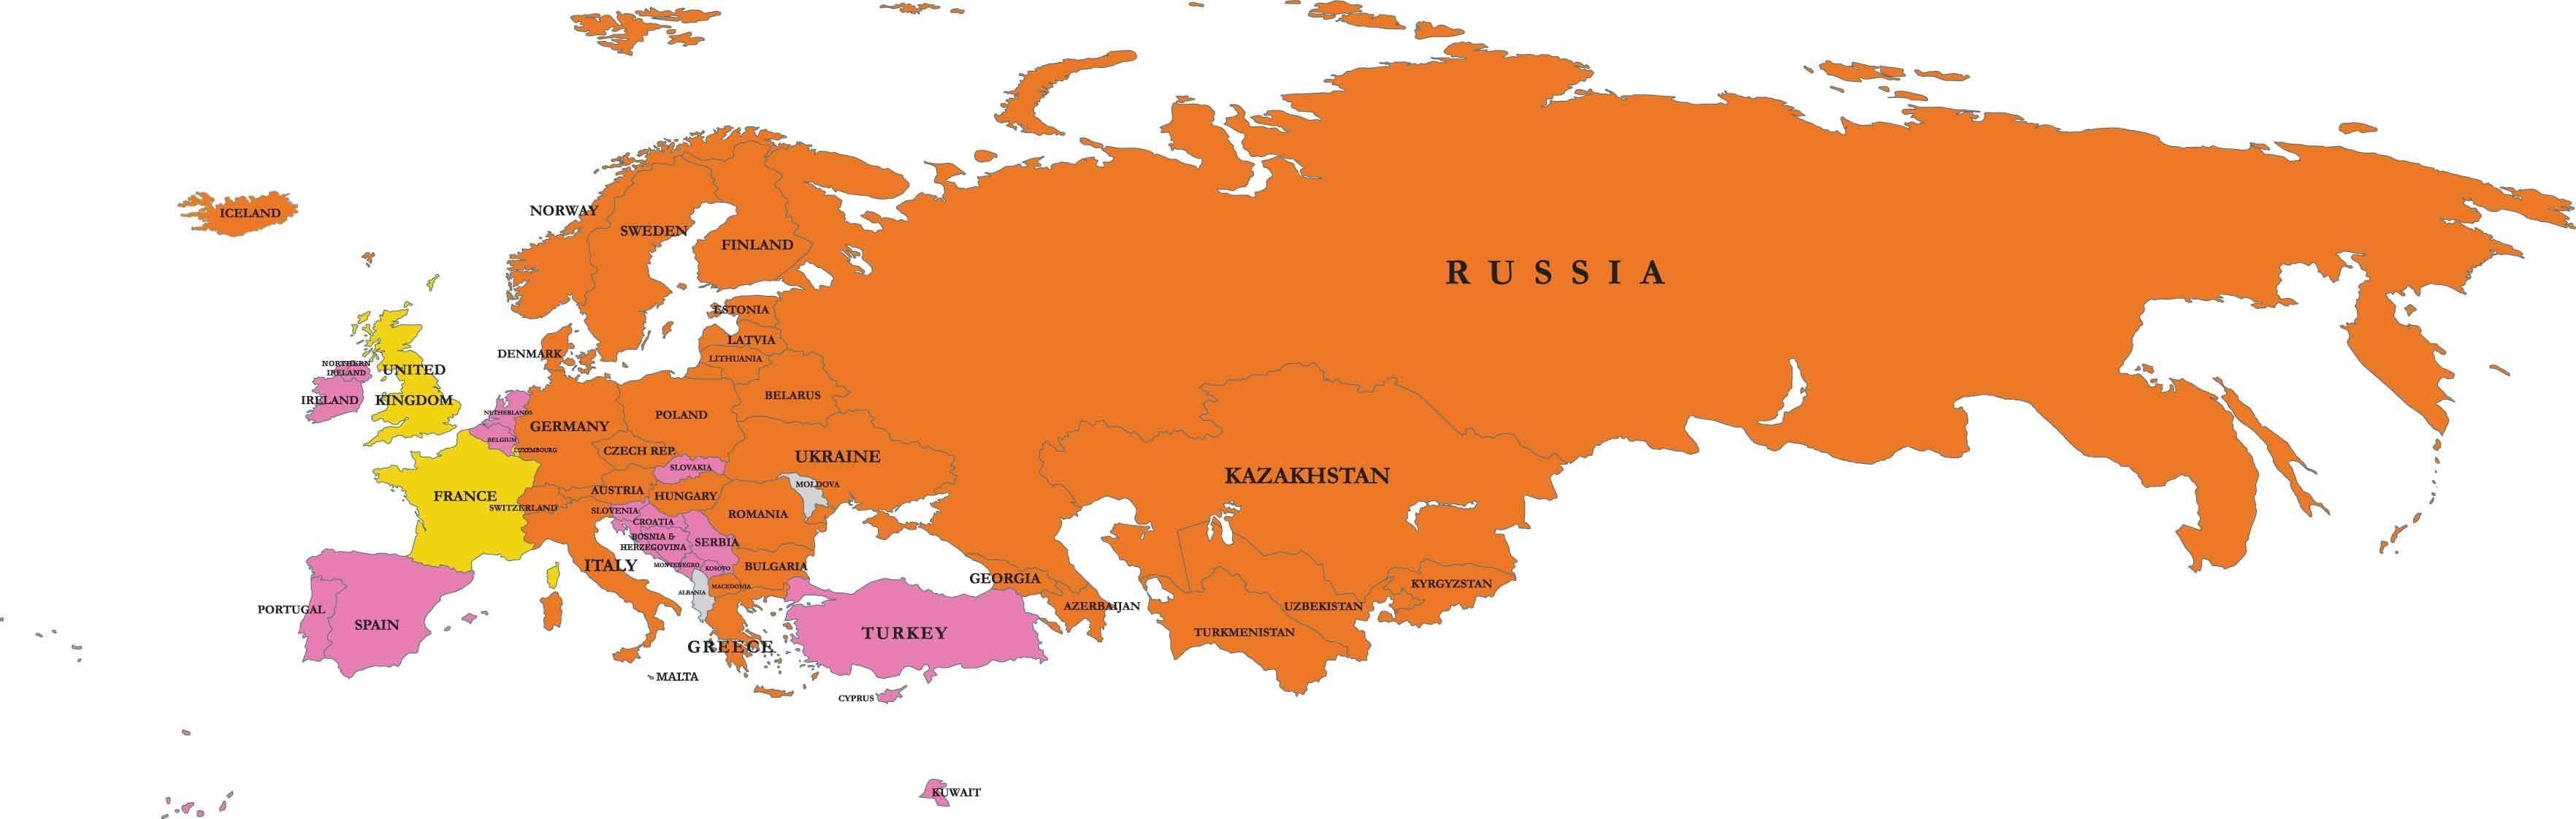 Evropi I Rusija Mapu Mapa Rusije I Evropi Istocne Evrope Evropi